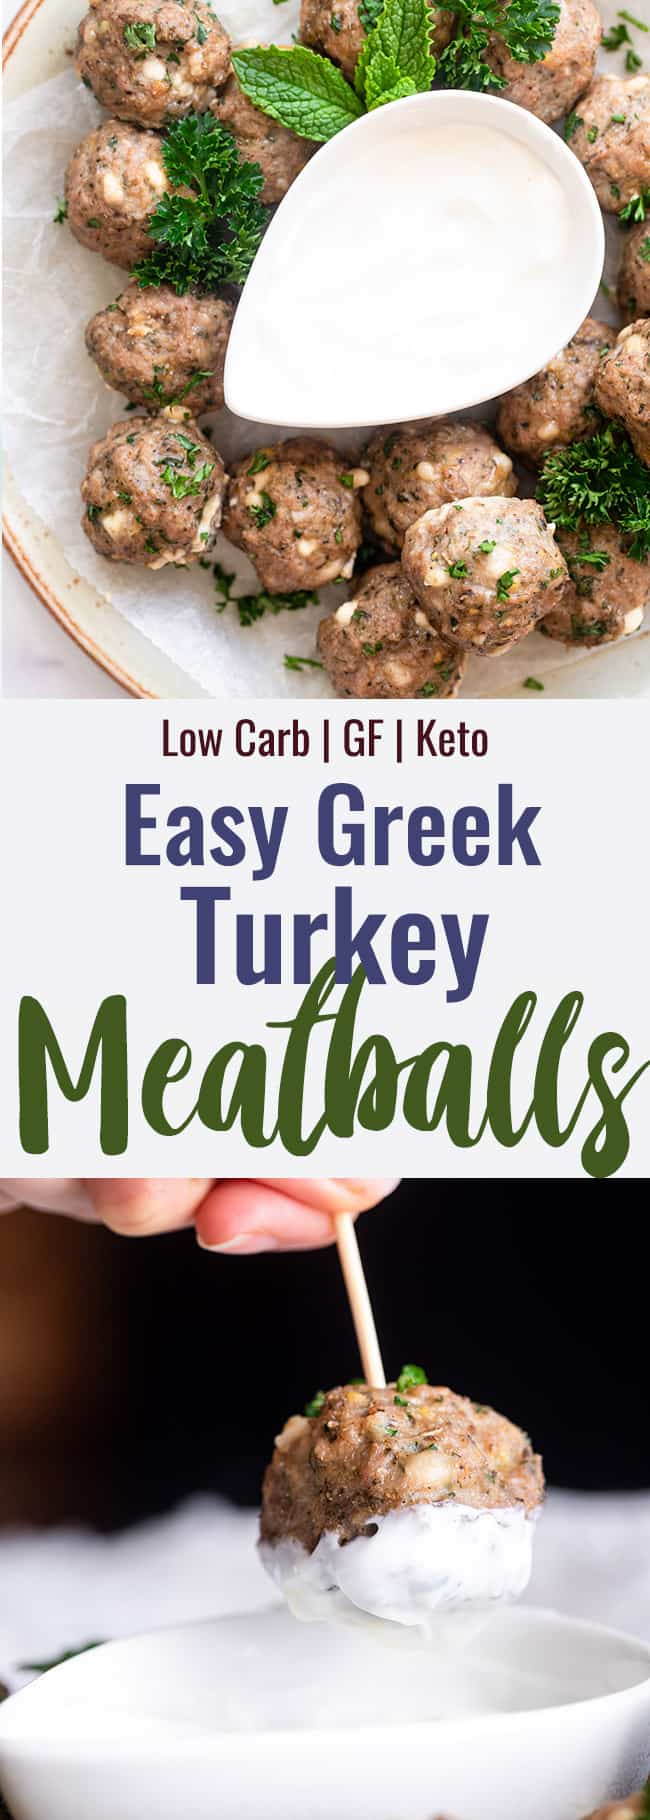 Greek Turkey Meatballs collage photo